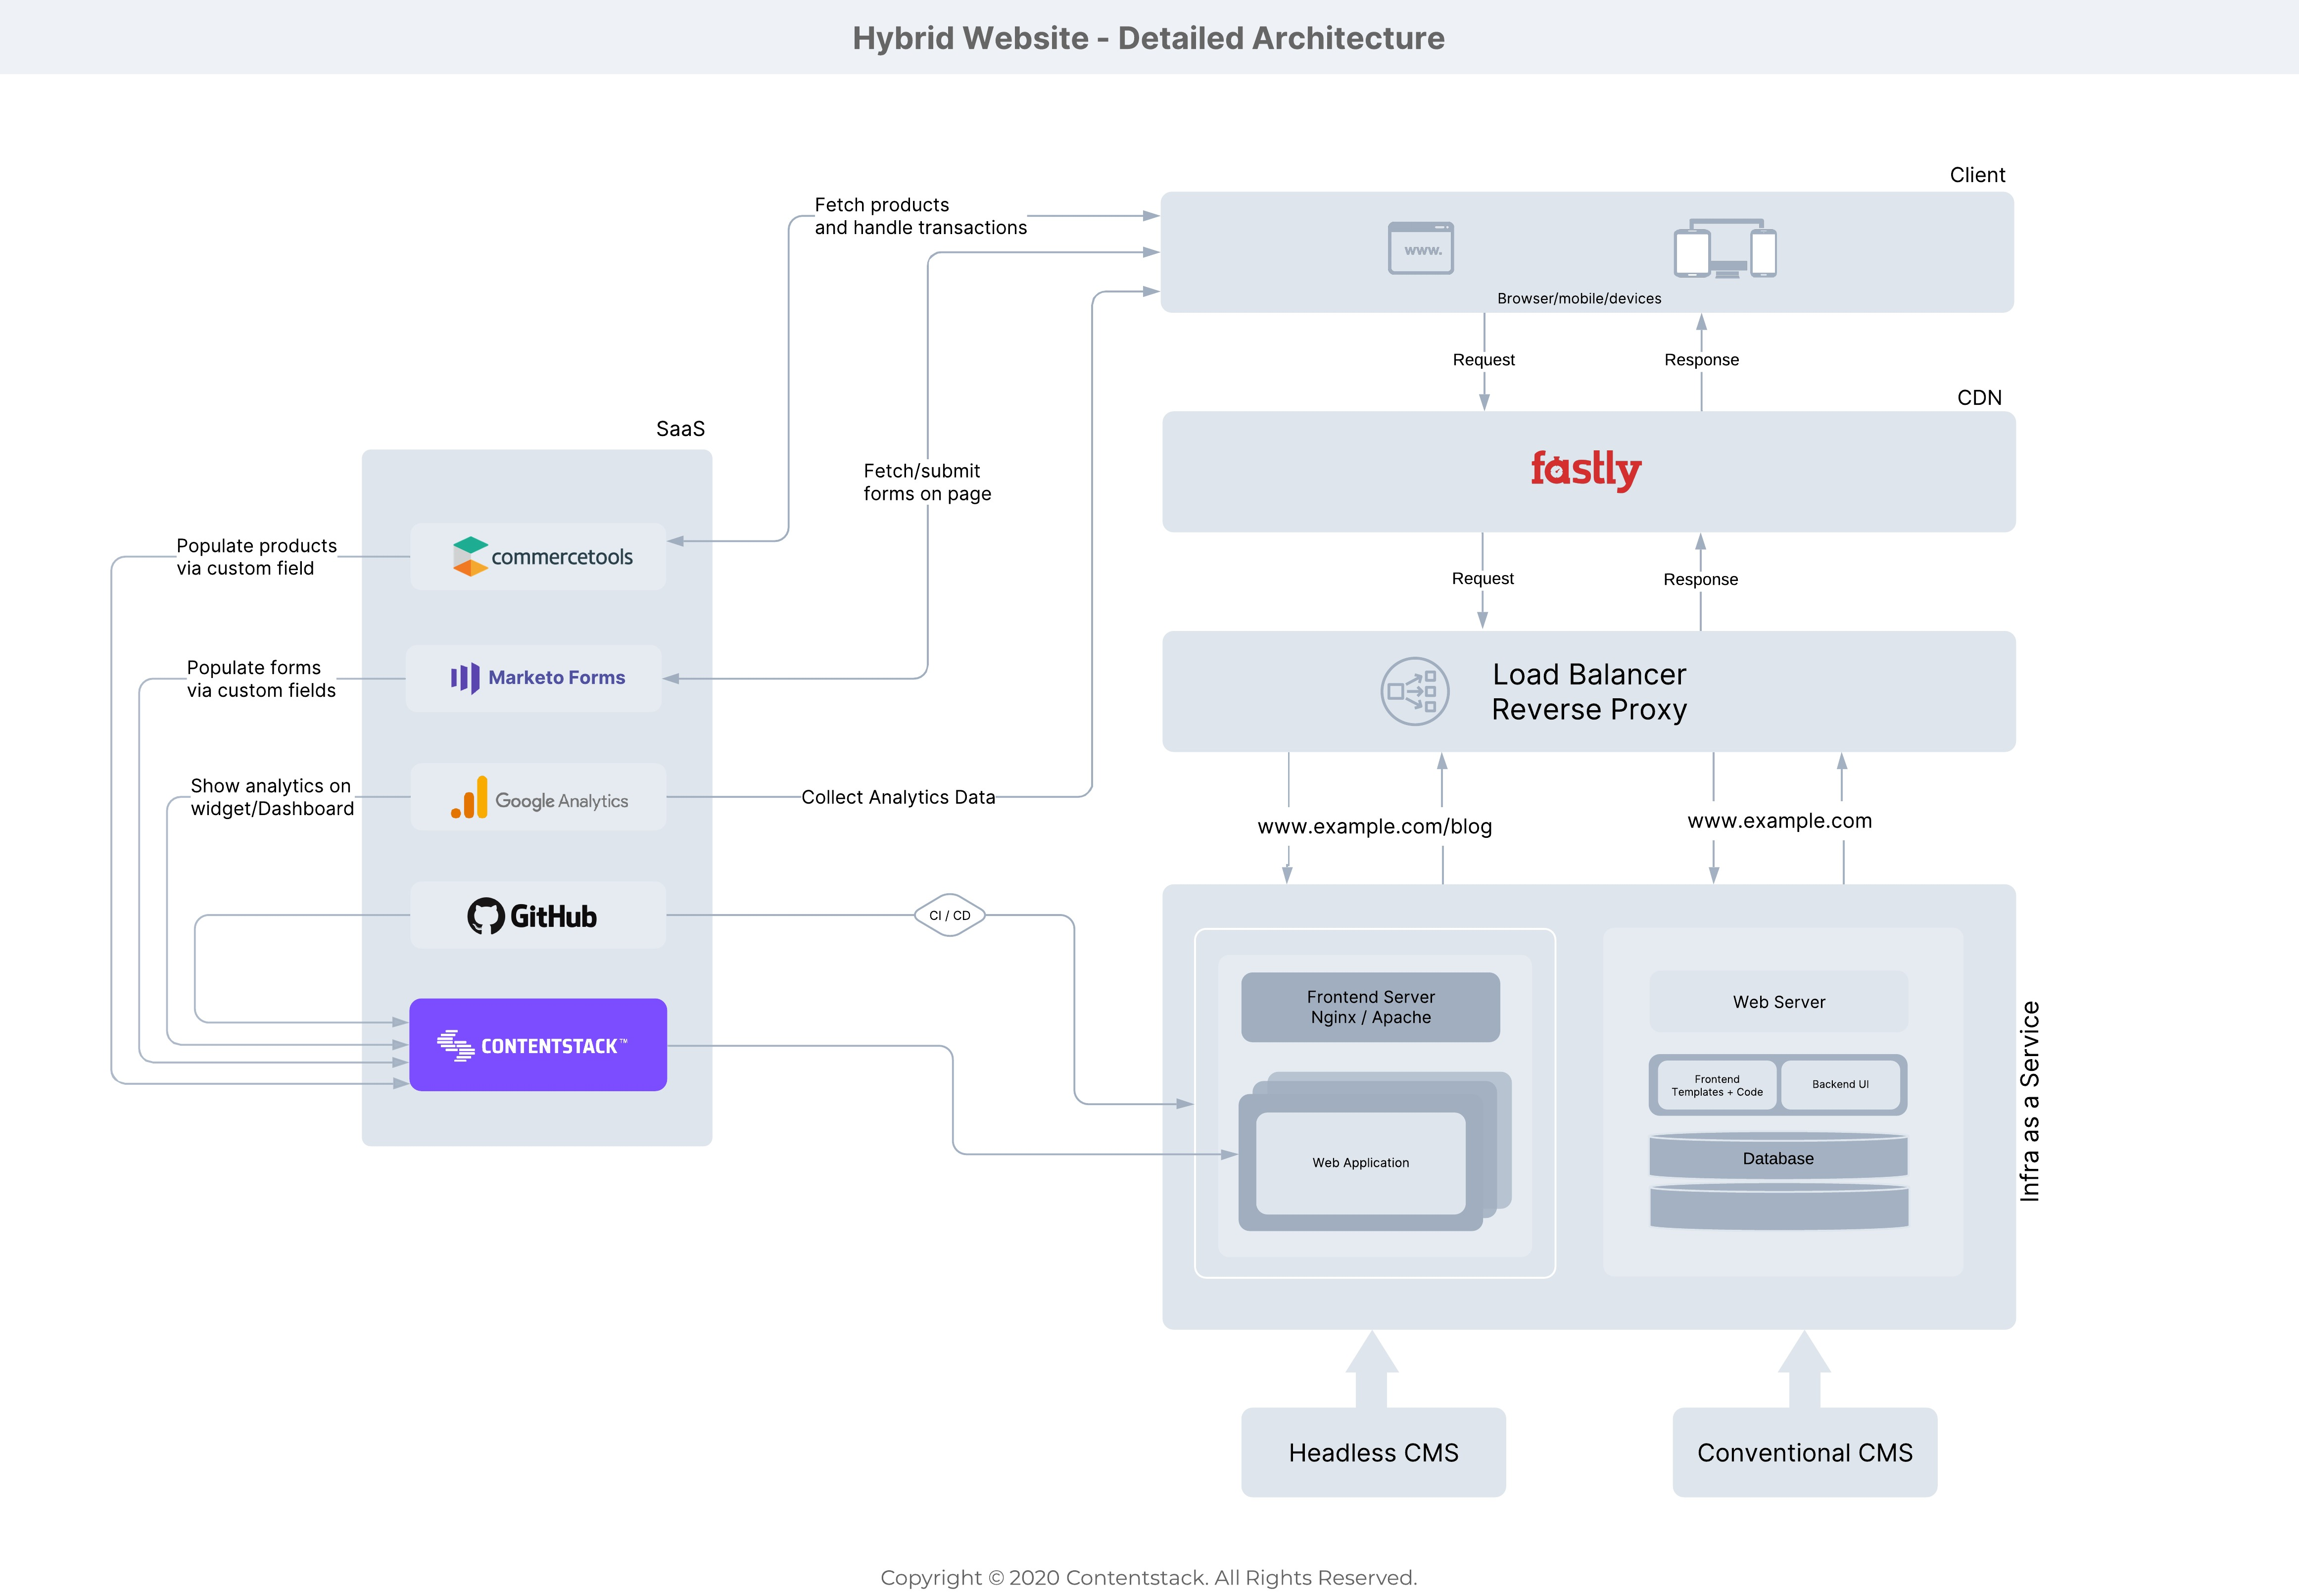 Hybrid_Website_-_Detailed_Architecture.jpeg